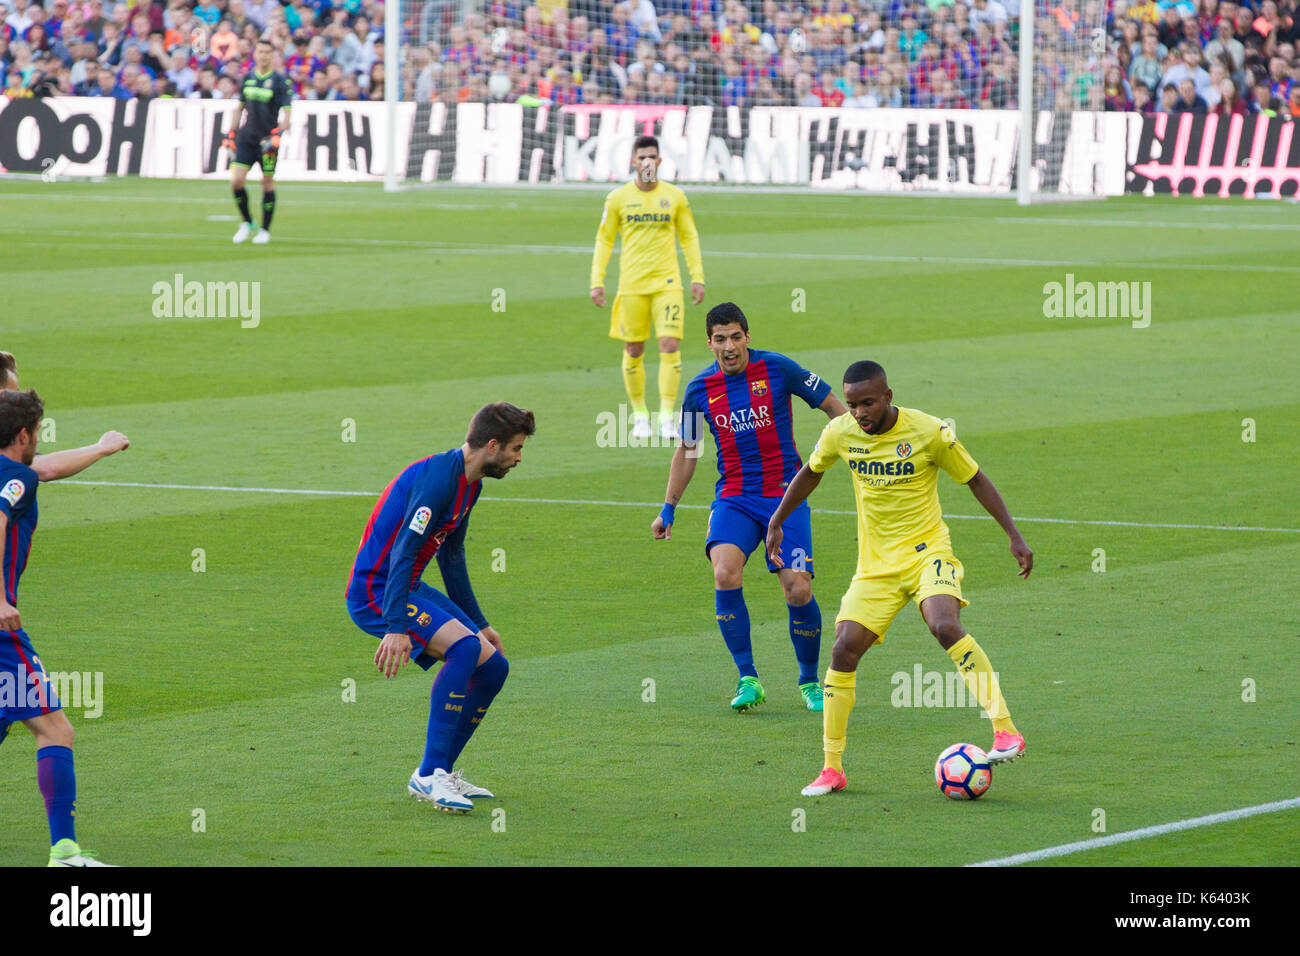 Gerard Piquet and Luis Suarez - 6/5/17 Barcelona v Villarreal football league match at the Camp Nou stadium, Barcelona. - Stock Image